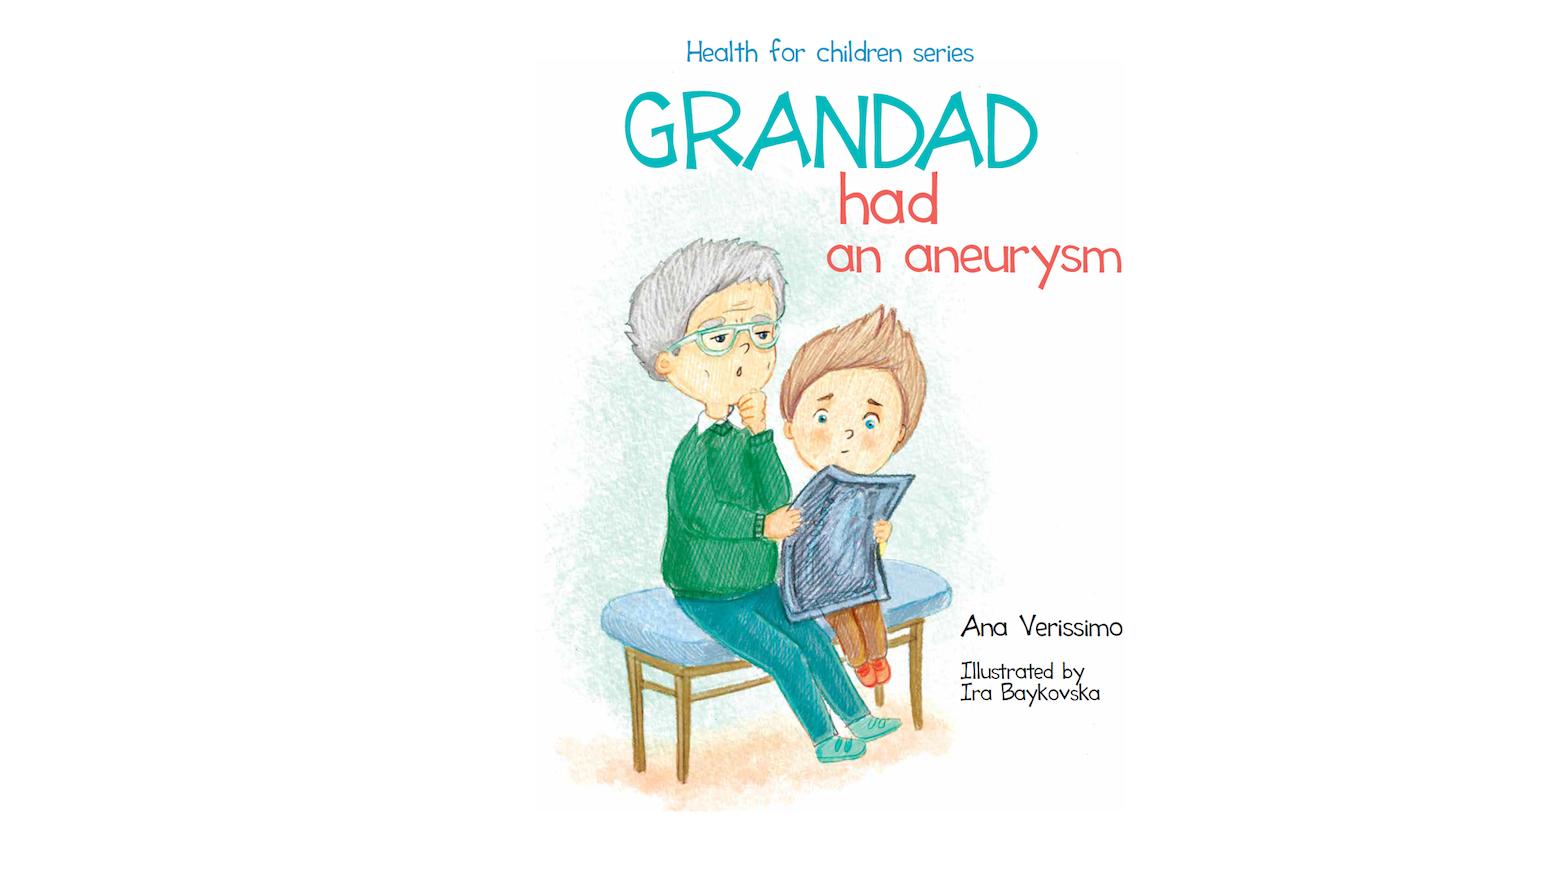 Grandad had an aneurysm